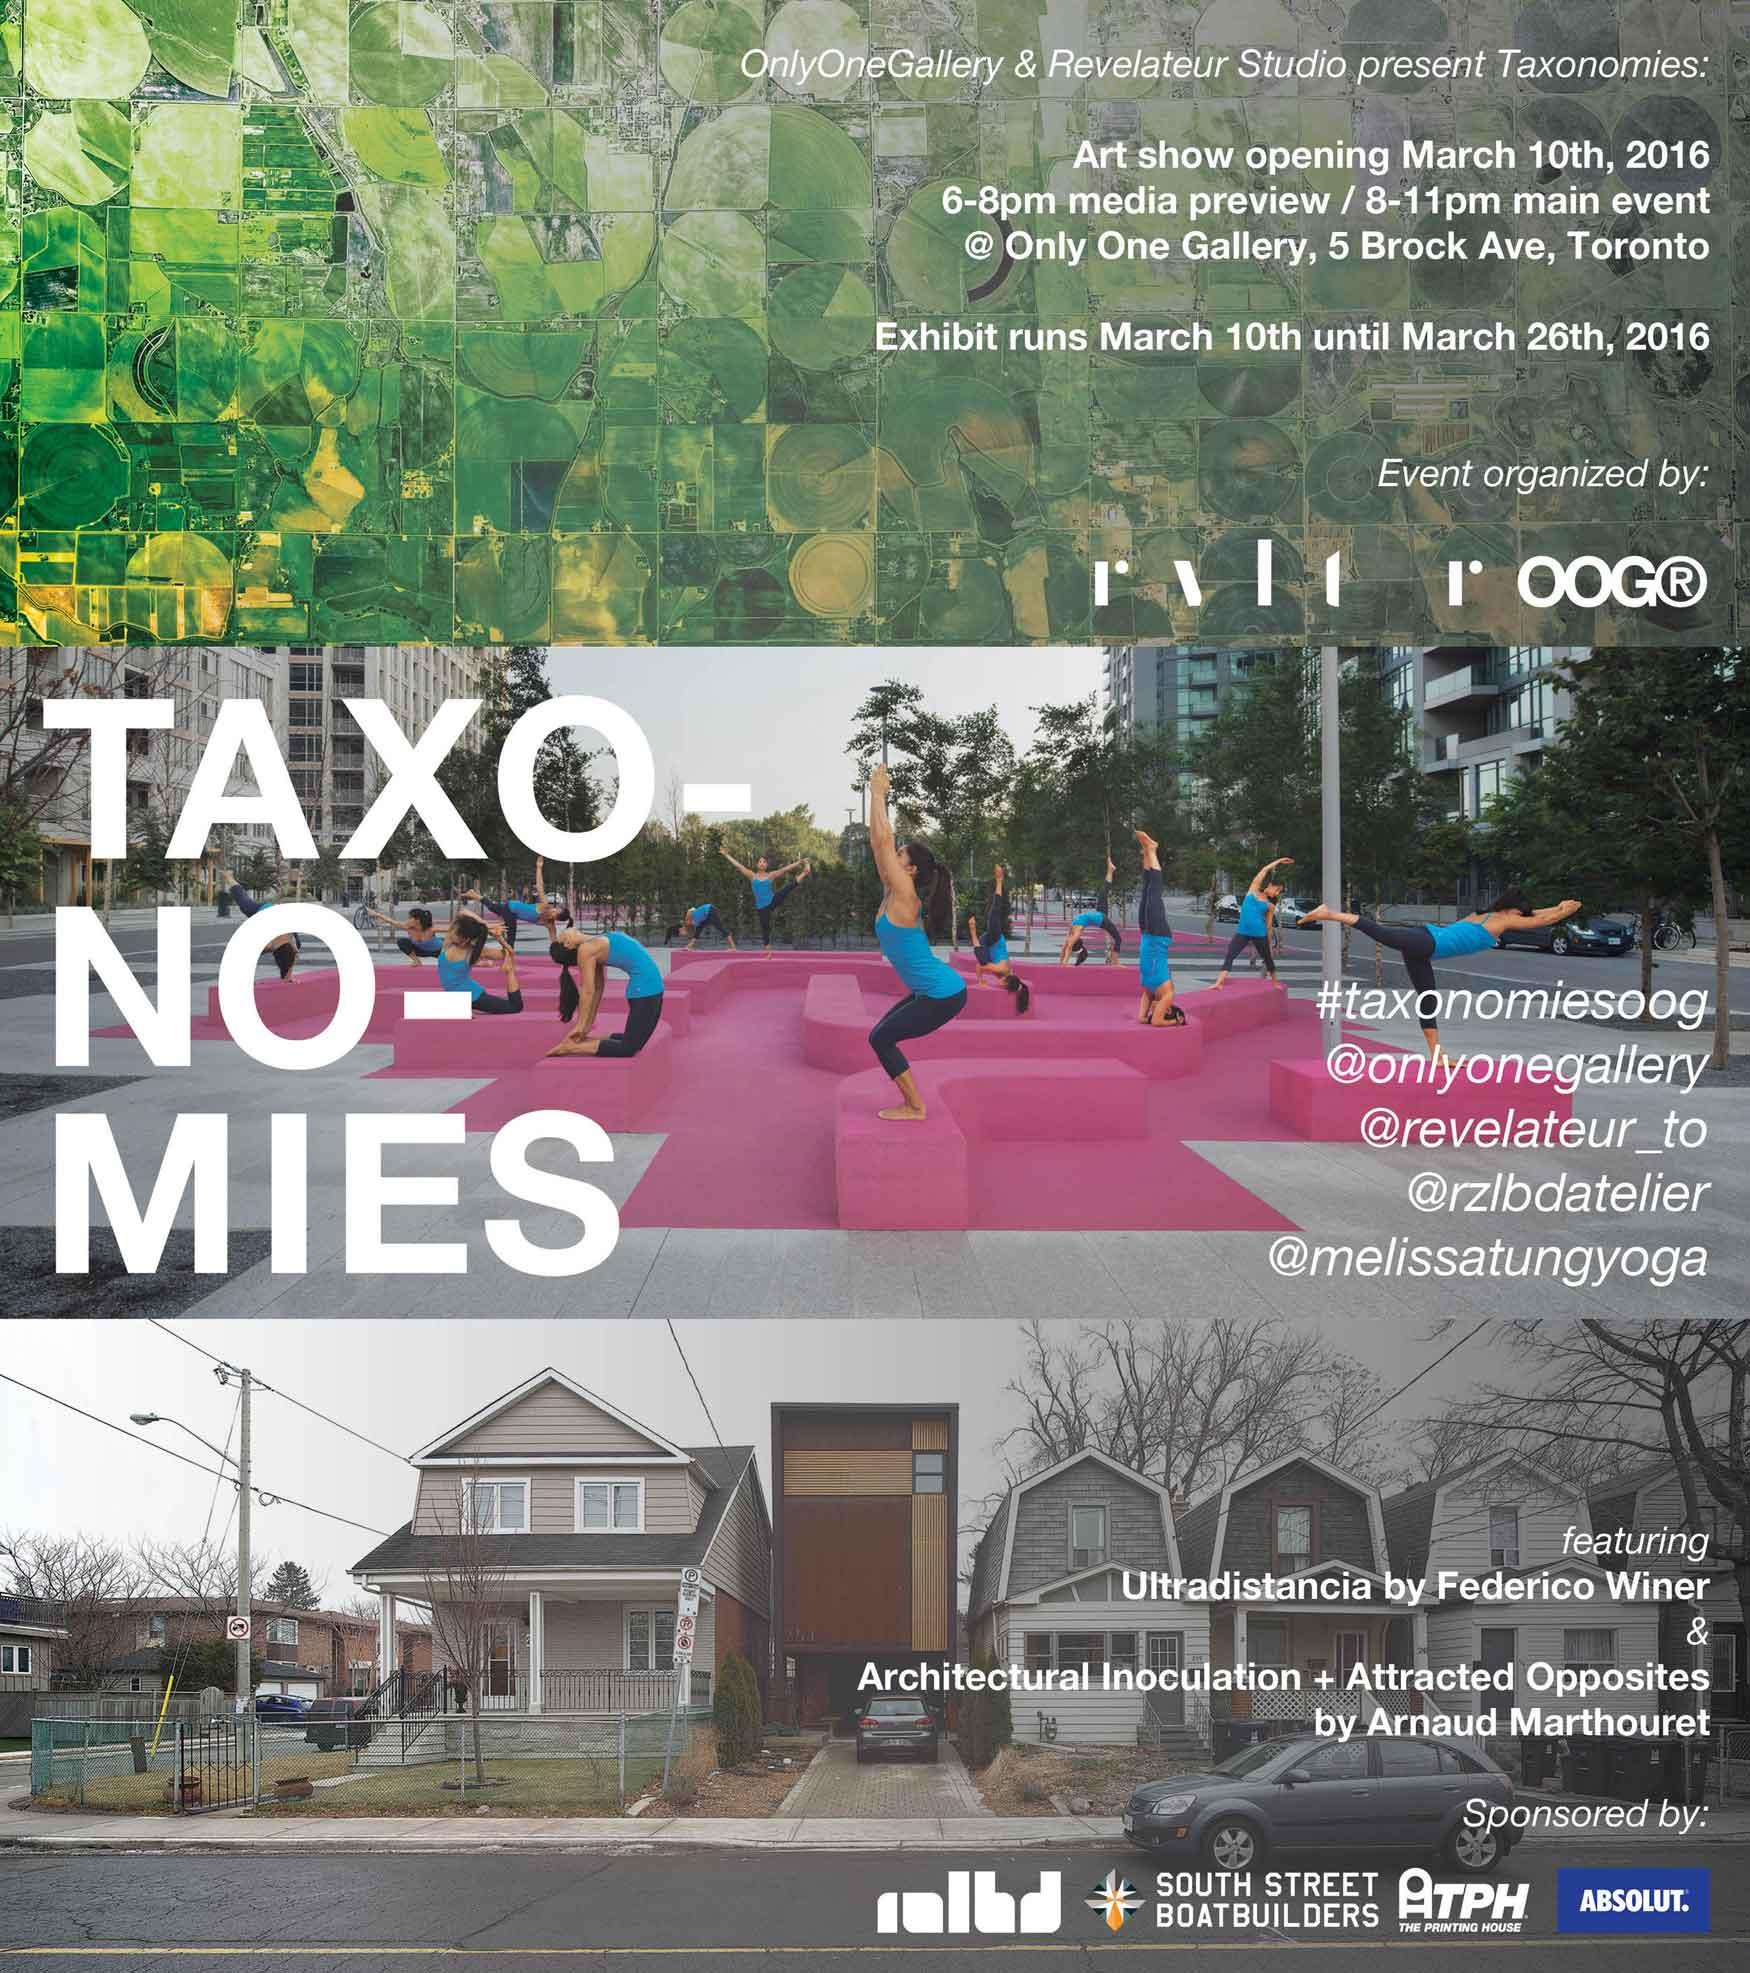 Ultradistancia-Taxonomies Exhibition at Onlyone Gallery Toronto. Flyer